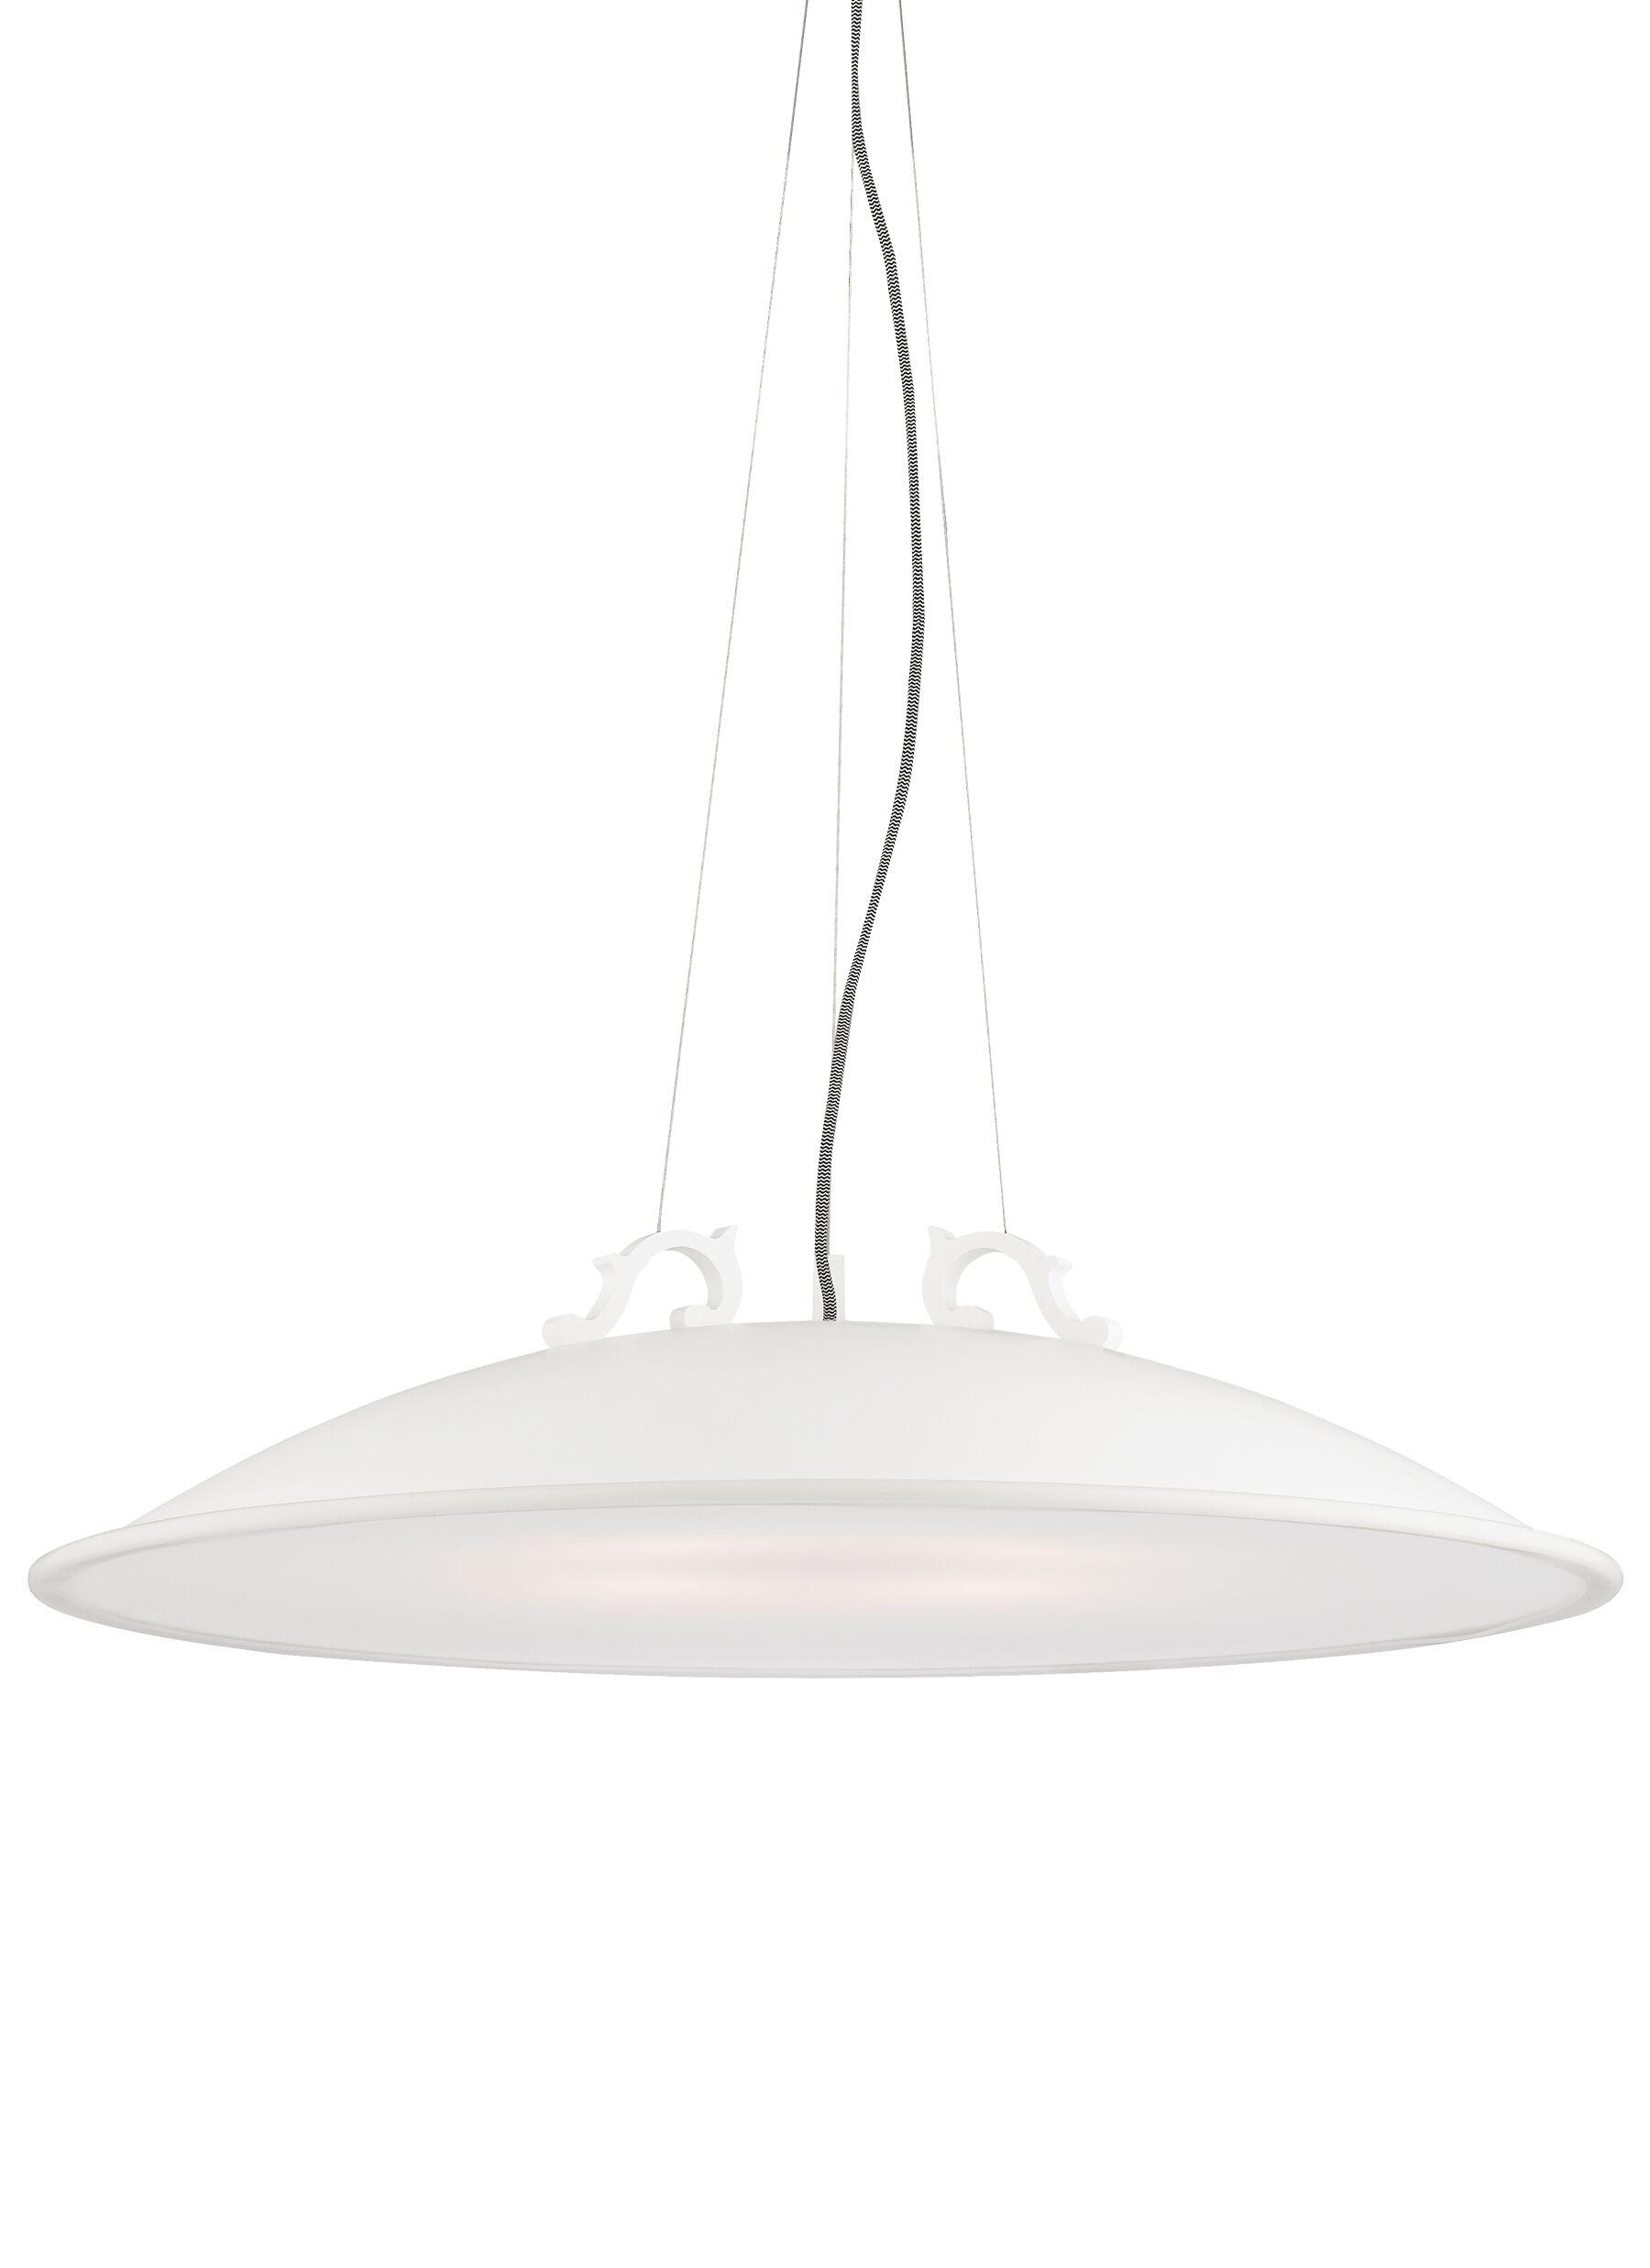 Malka Grande 3-Light Bowl Pendant Bulb Type: Compact�Fluorescent 120V, Finish: Rubberized White